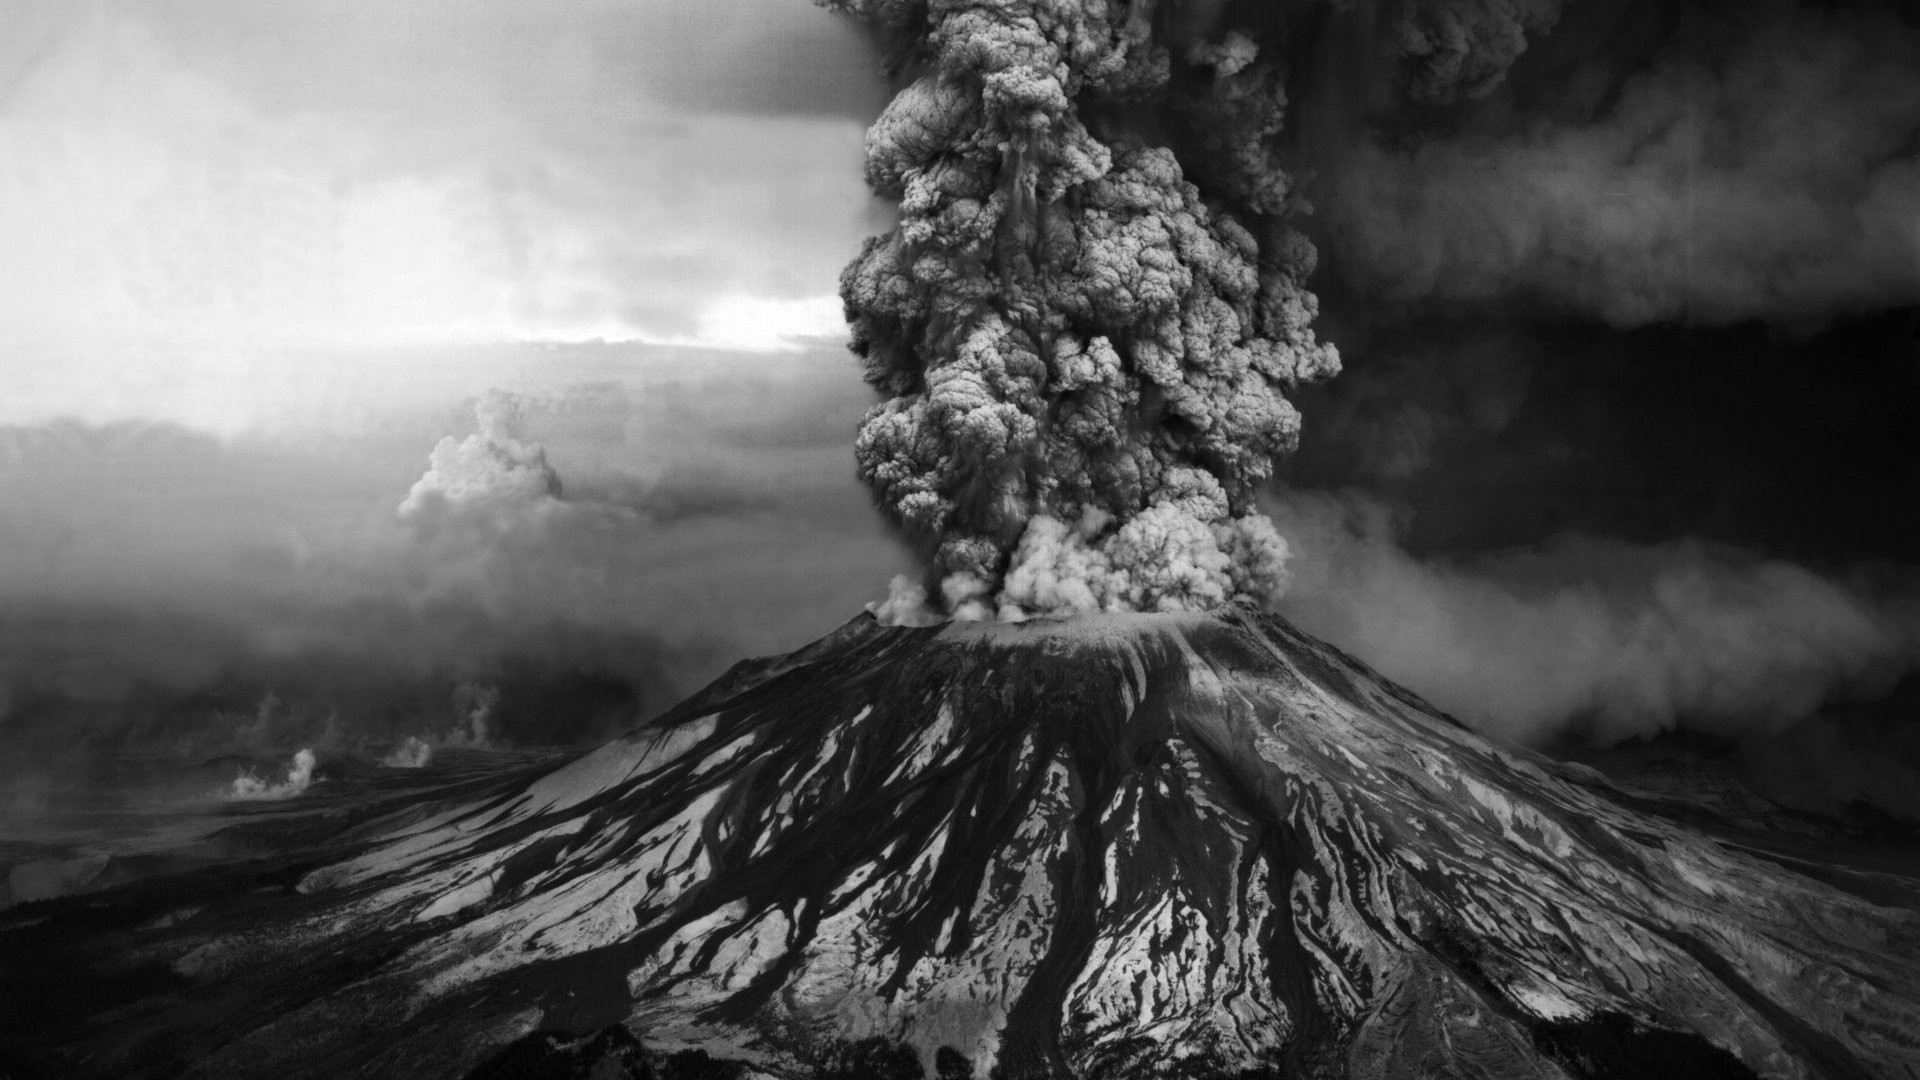 1920x1080 Volcanoes Smoke wallpaper